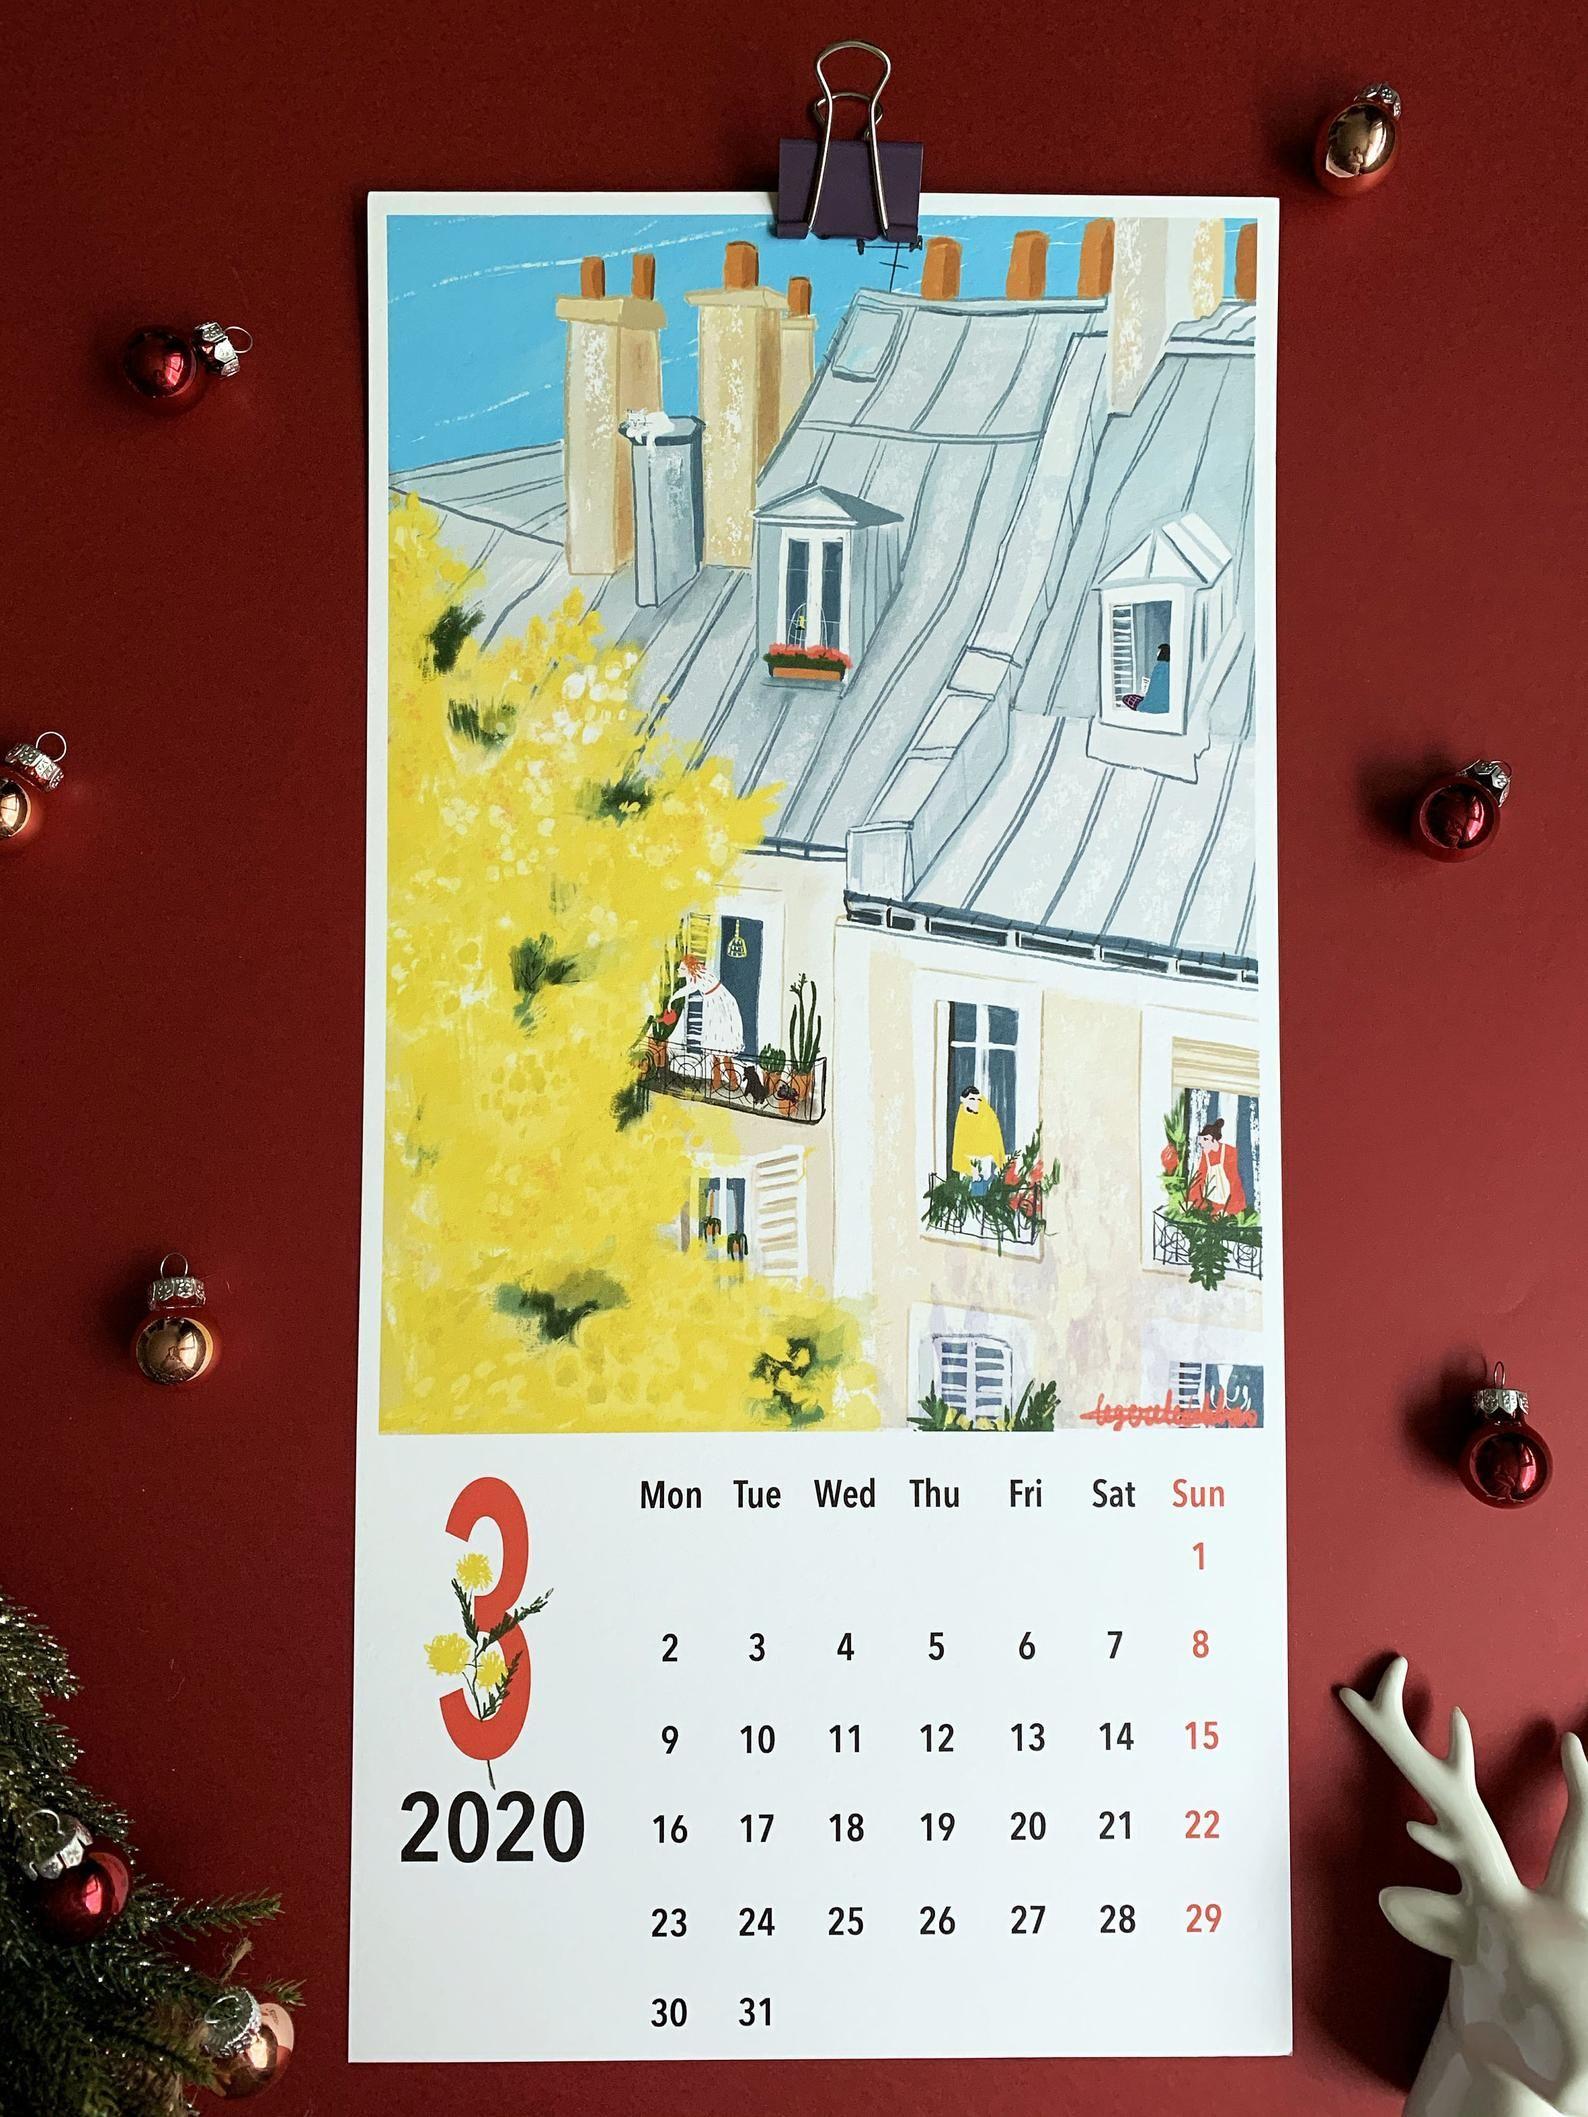 2020 Wall Calendar|happy new year 2020|Illustrated ...